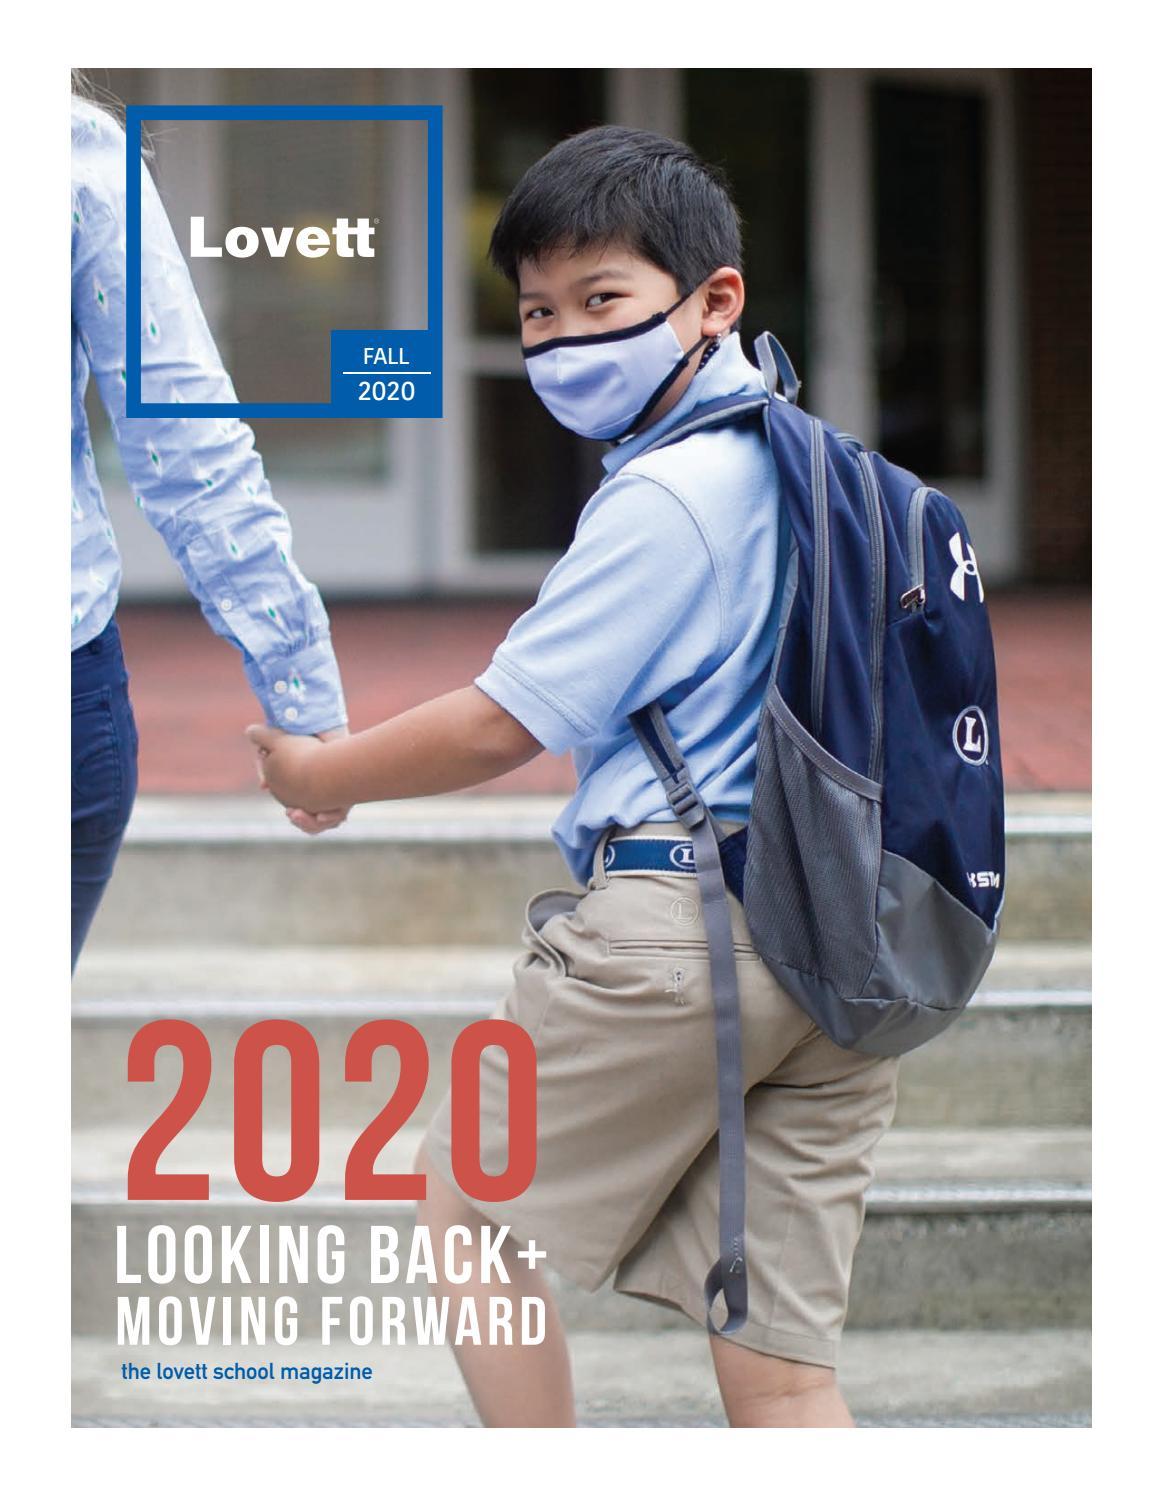 The Lovett School Magazine, Fall 2020